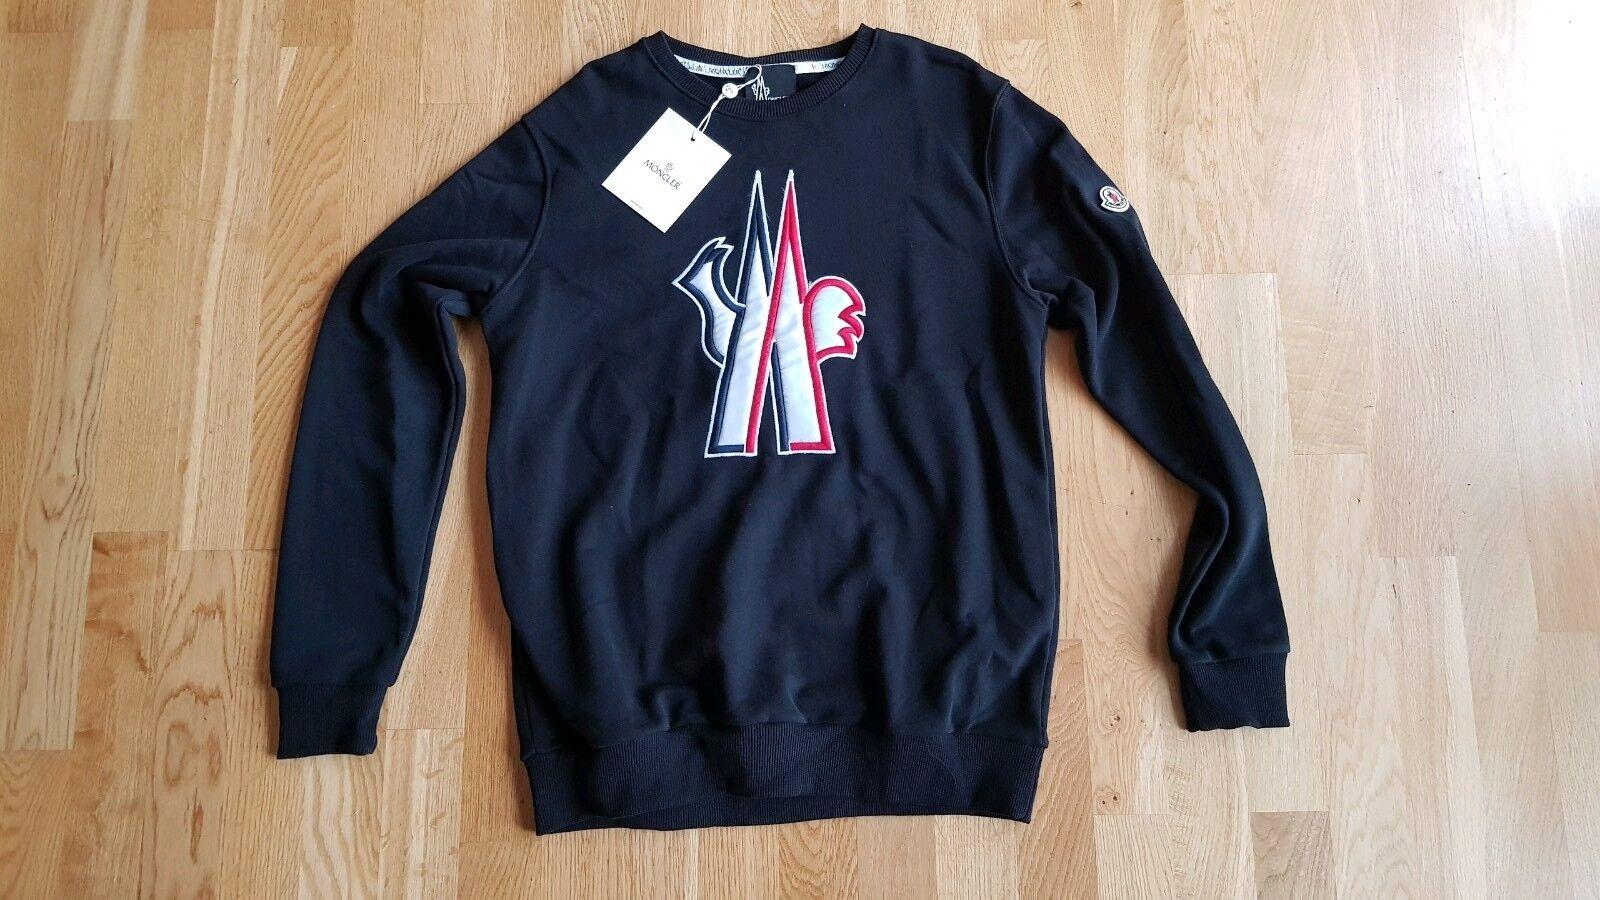 NEU Moncler Herren Pullover Herrenpullover Gr. Lschwarz modern Logo Shirt